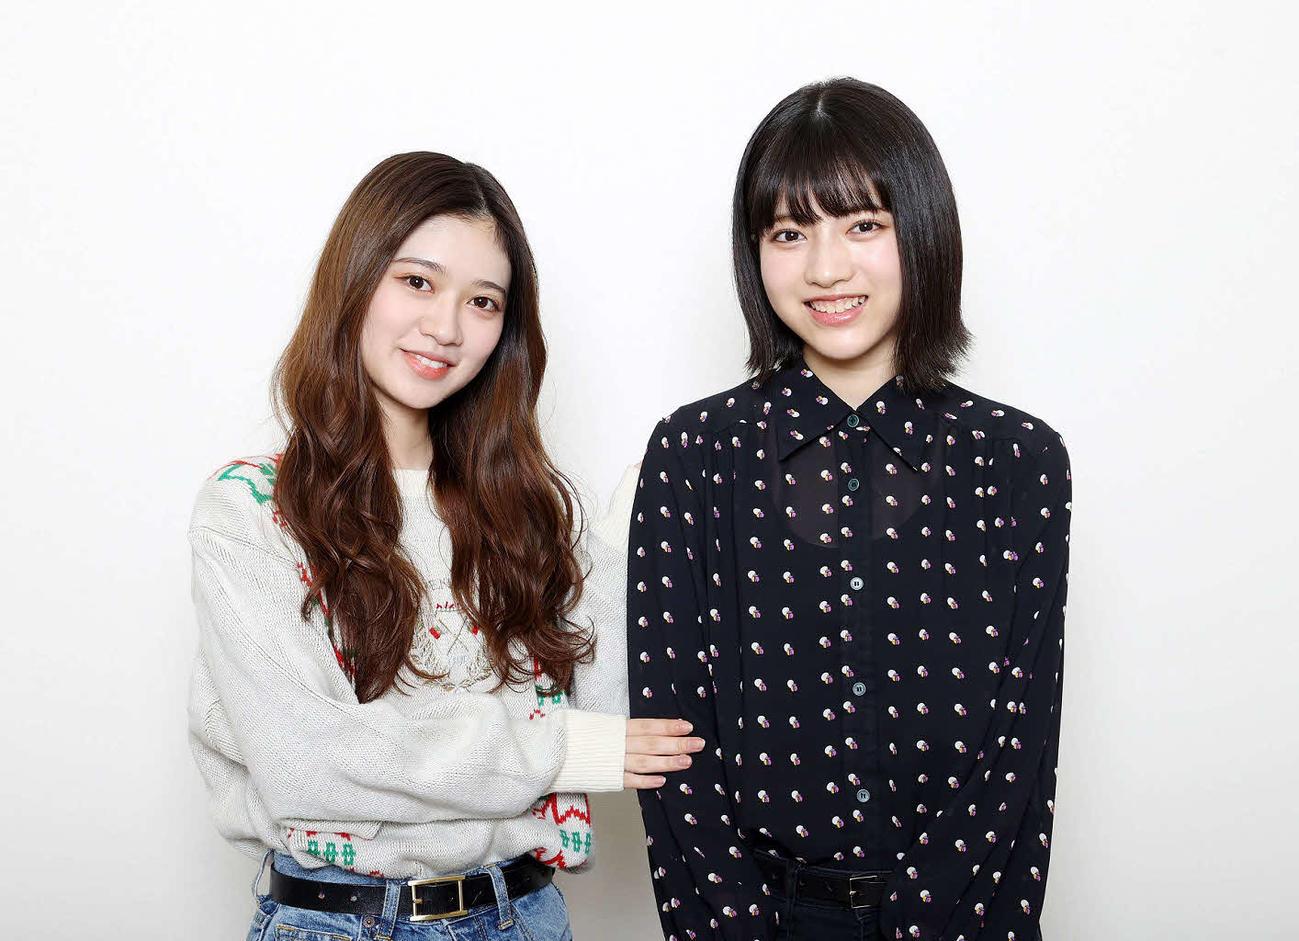 乃木坂46寺田蘭世(左)と林瑠奈